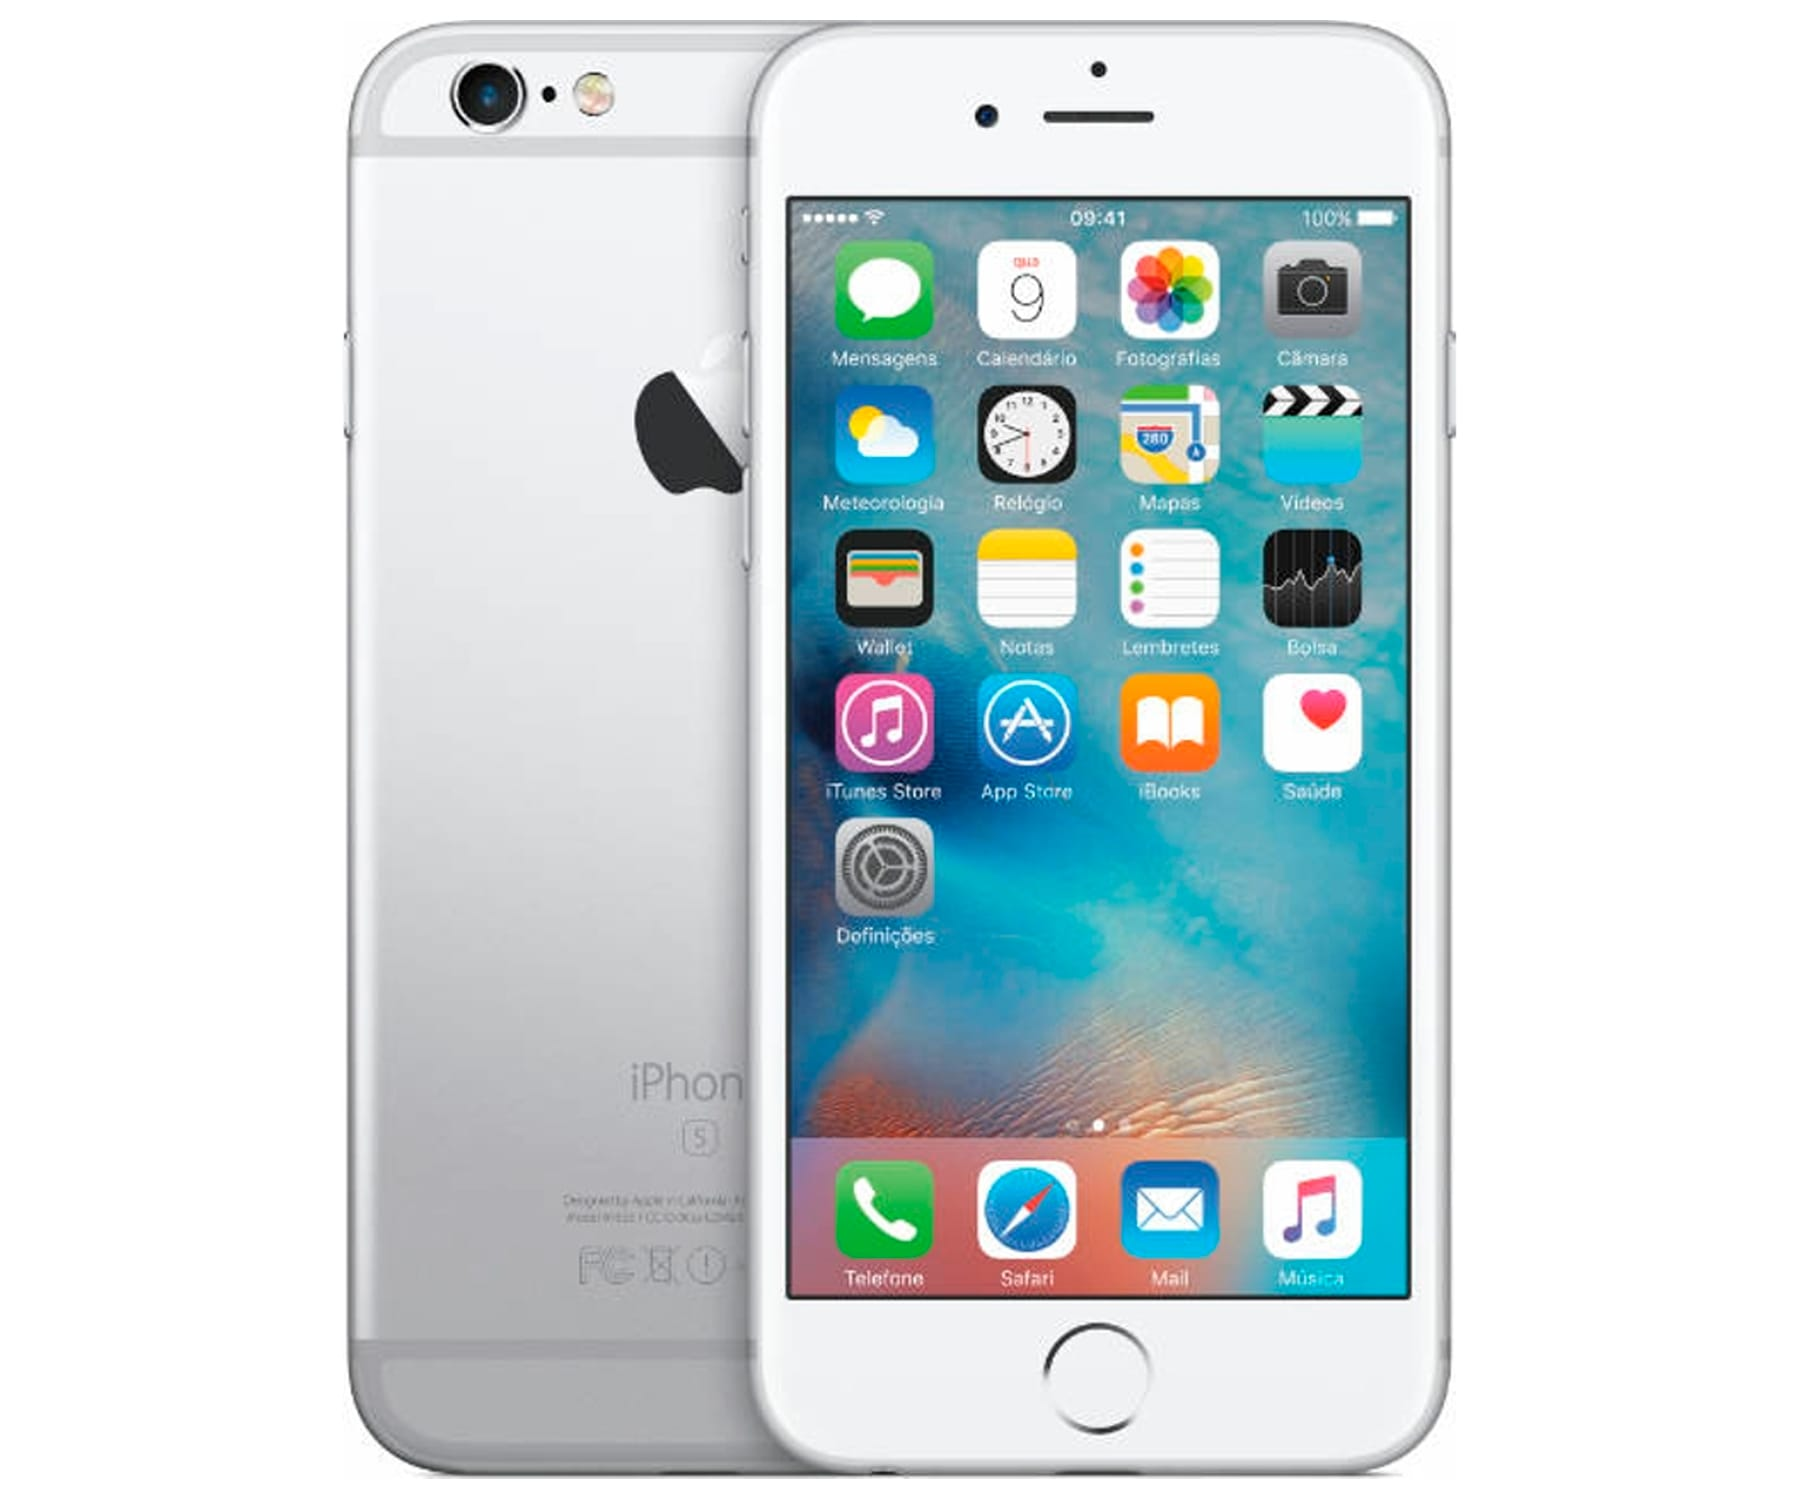 APPLE IPHONE 6S 64GB PLATA REACONDICIONADO CPO MÓVIL 4G 4.7'' RETINA HD/2CORE/64GB/2GB RAM/12MP/5MP